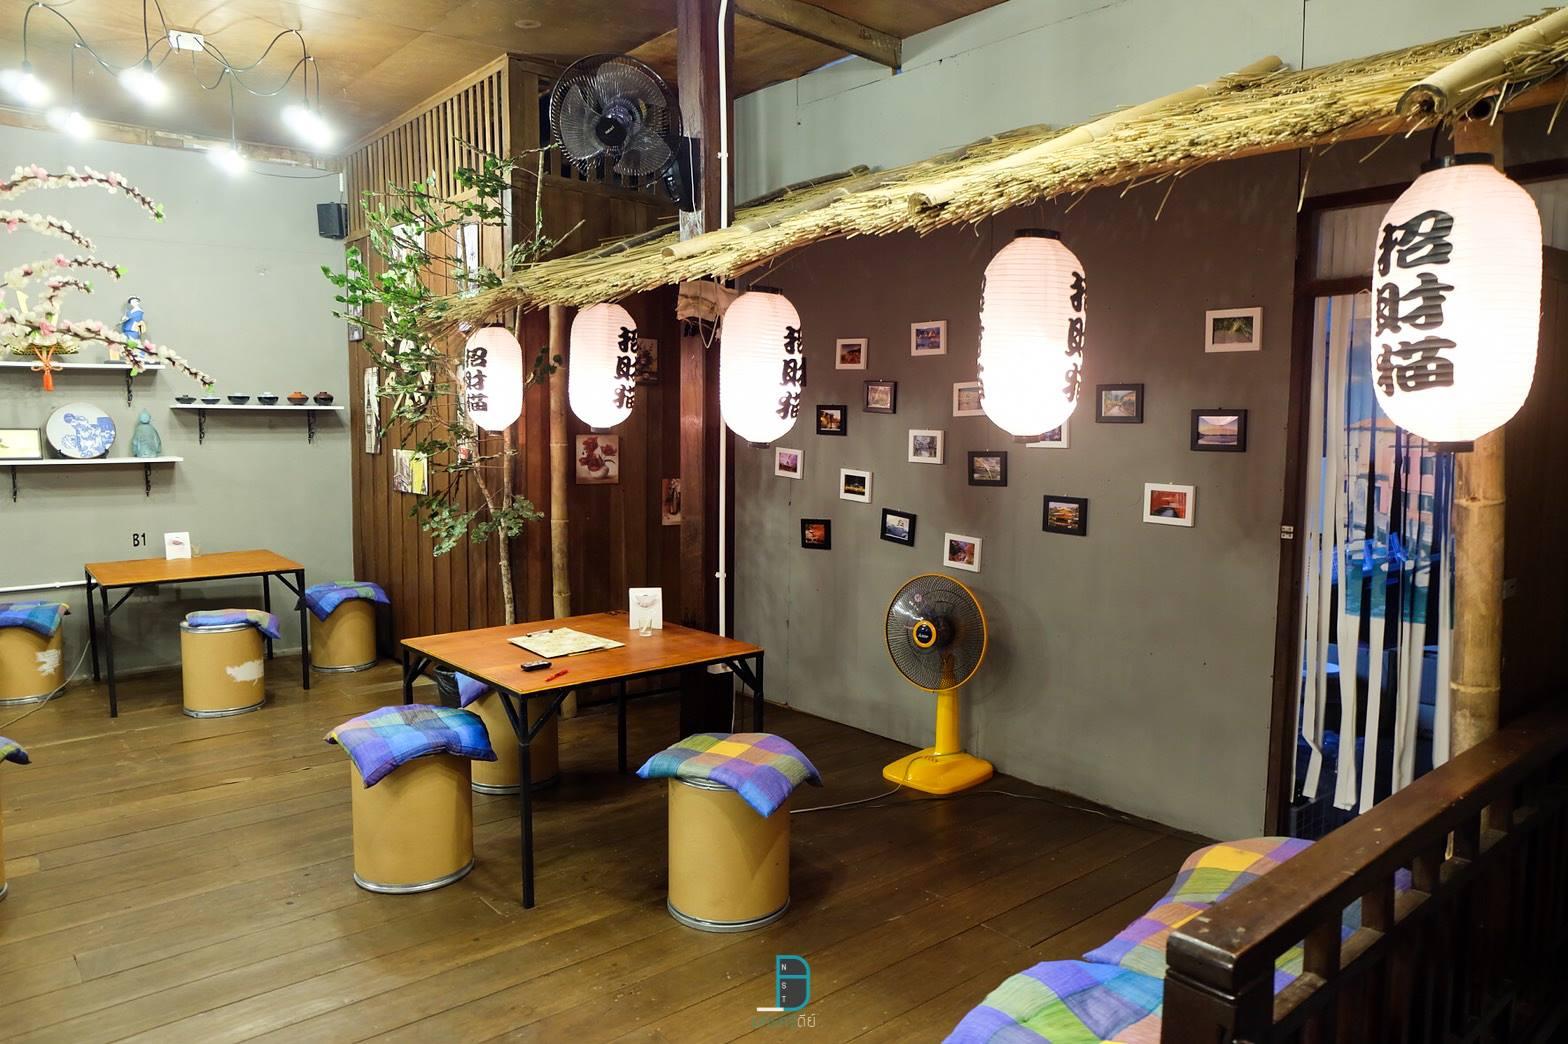 Subarashii ซูบาราชิ ร้านชาบู หม้อไฟเกาหลี ชะอวด นครศรีธรรมราช นครศรีดีย์